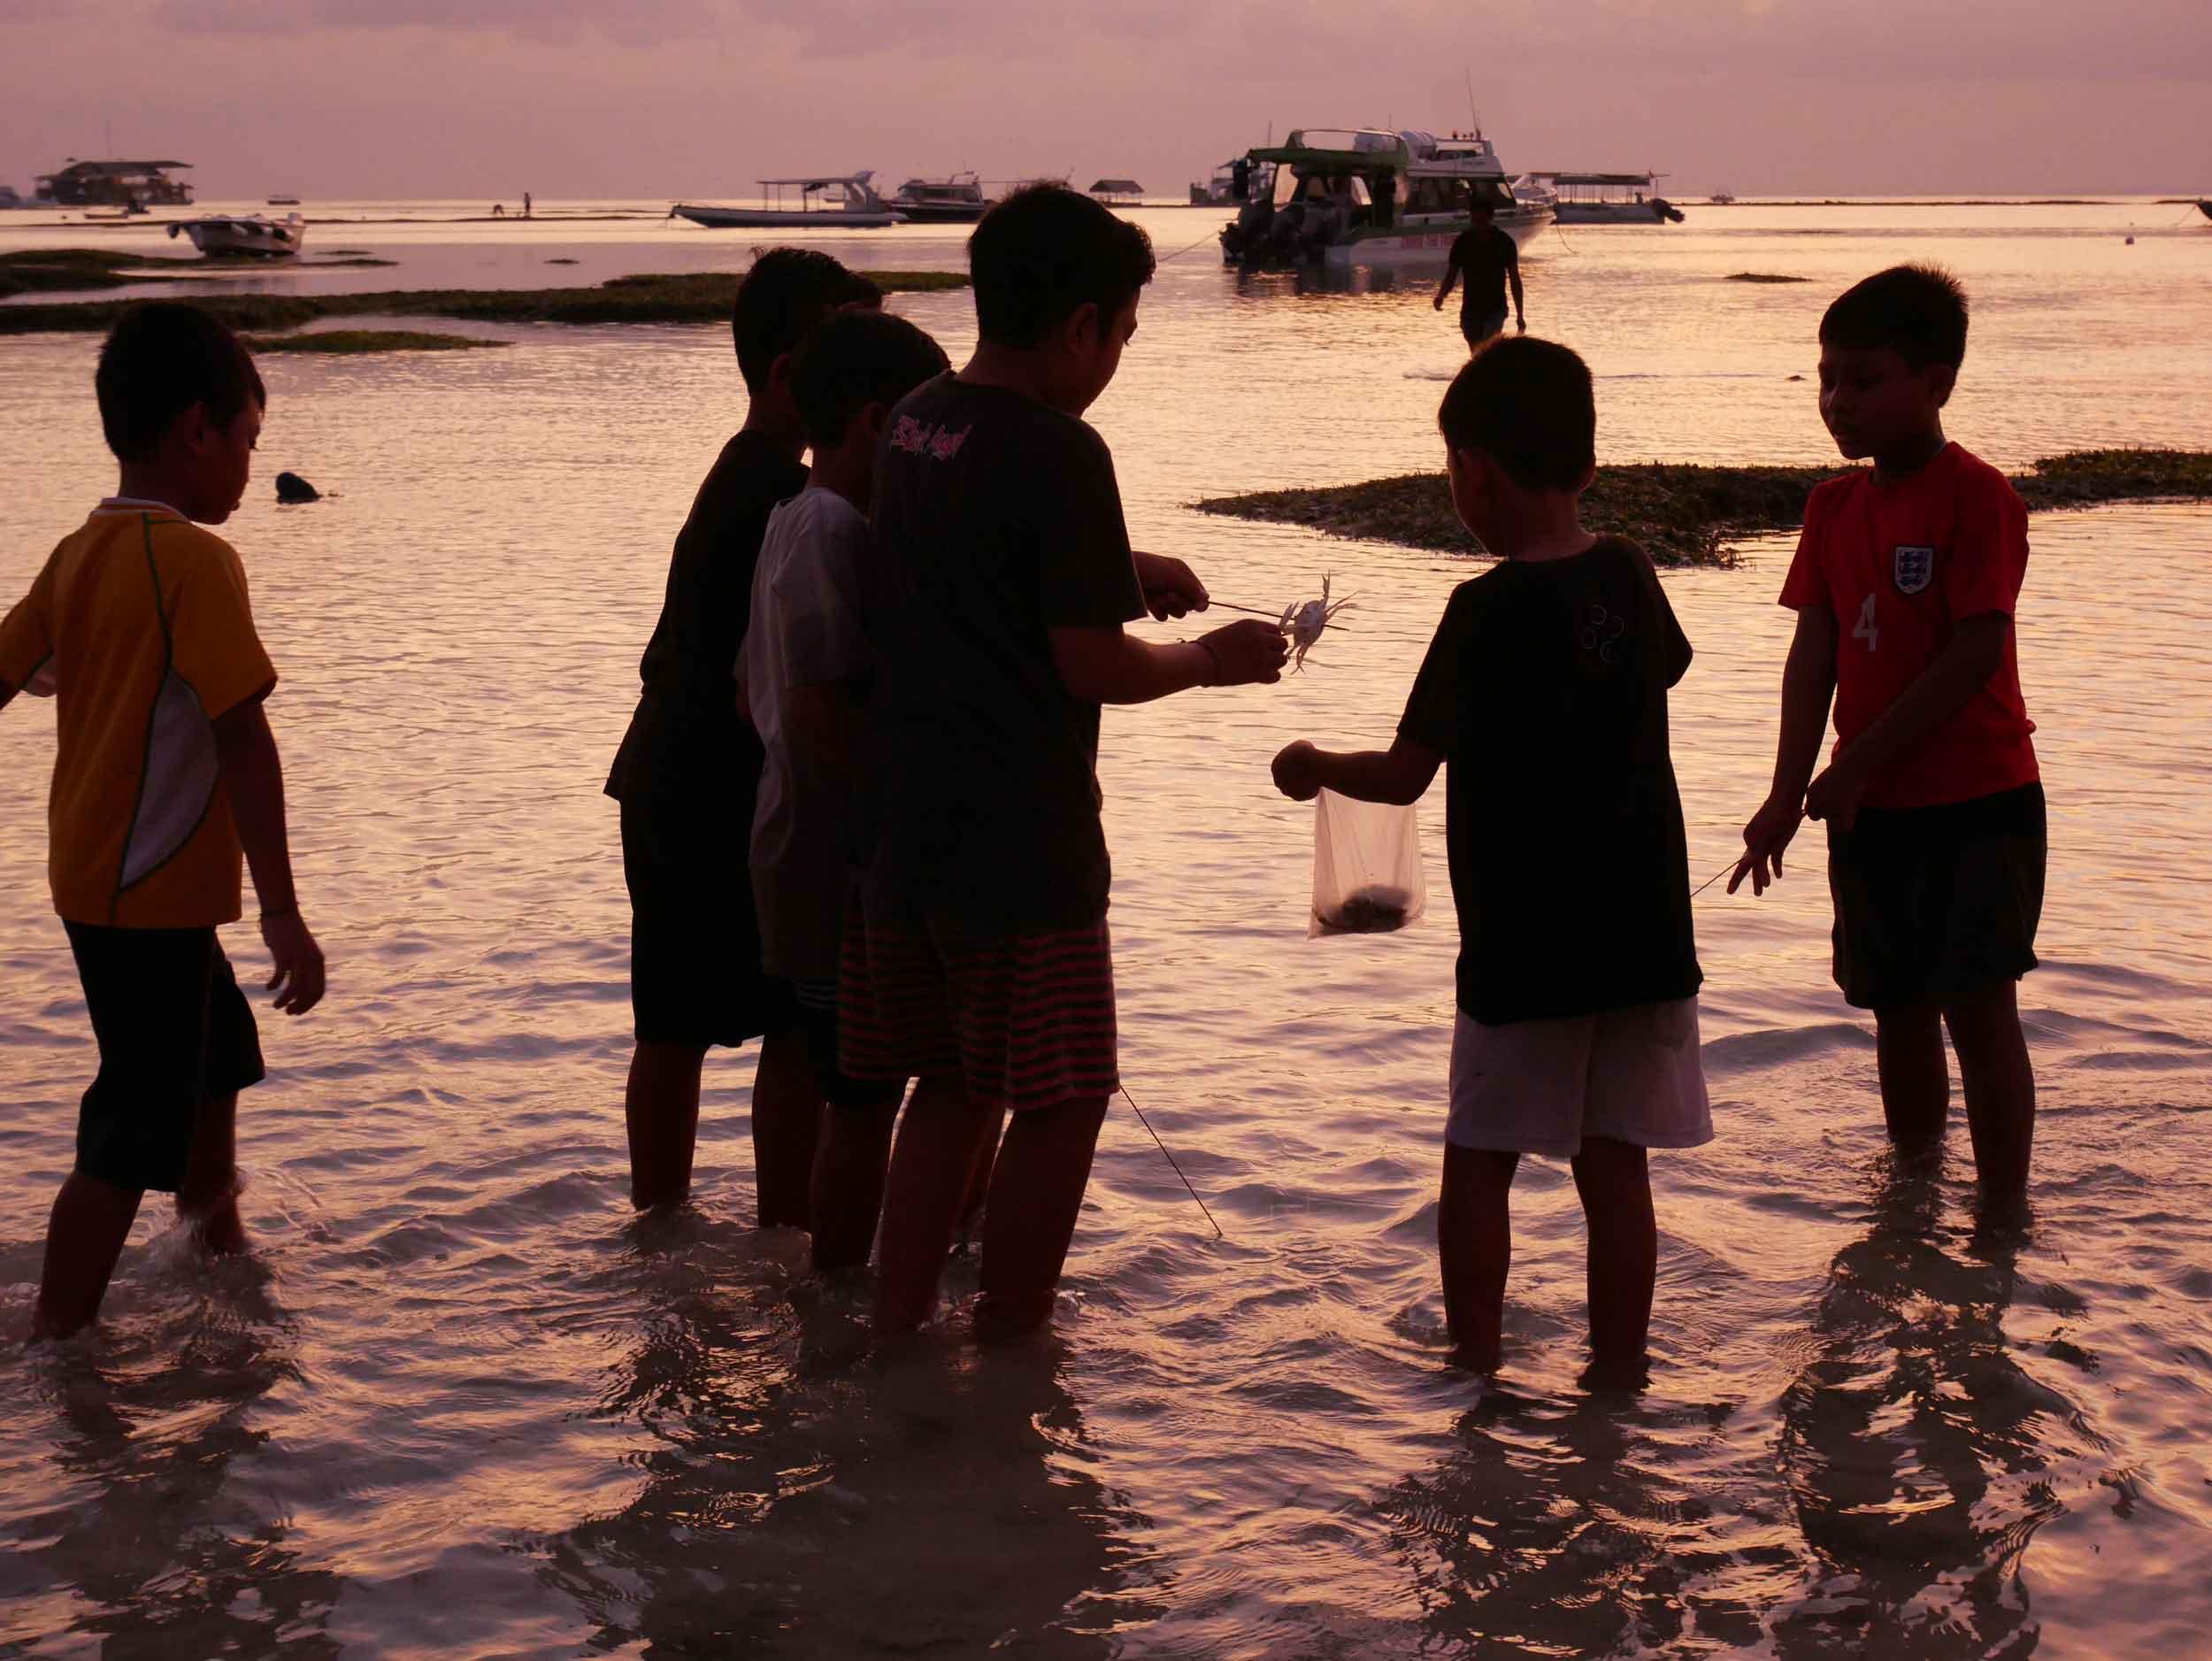 Young Balinese children playing and hunting for fish as we docked at sunset near Nusa Lembongan, Bali (May 14).